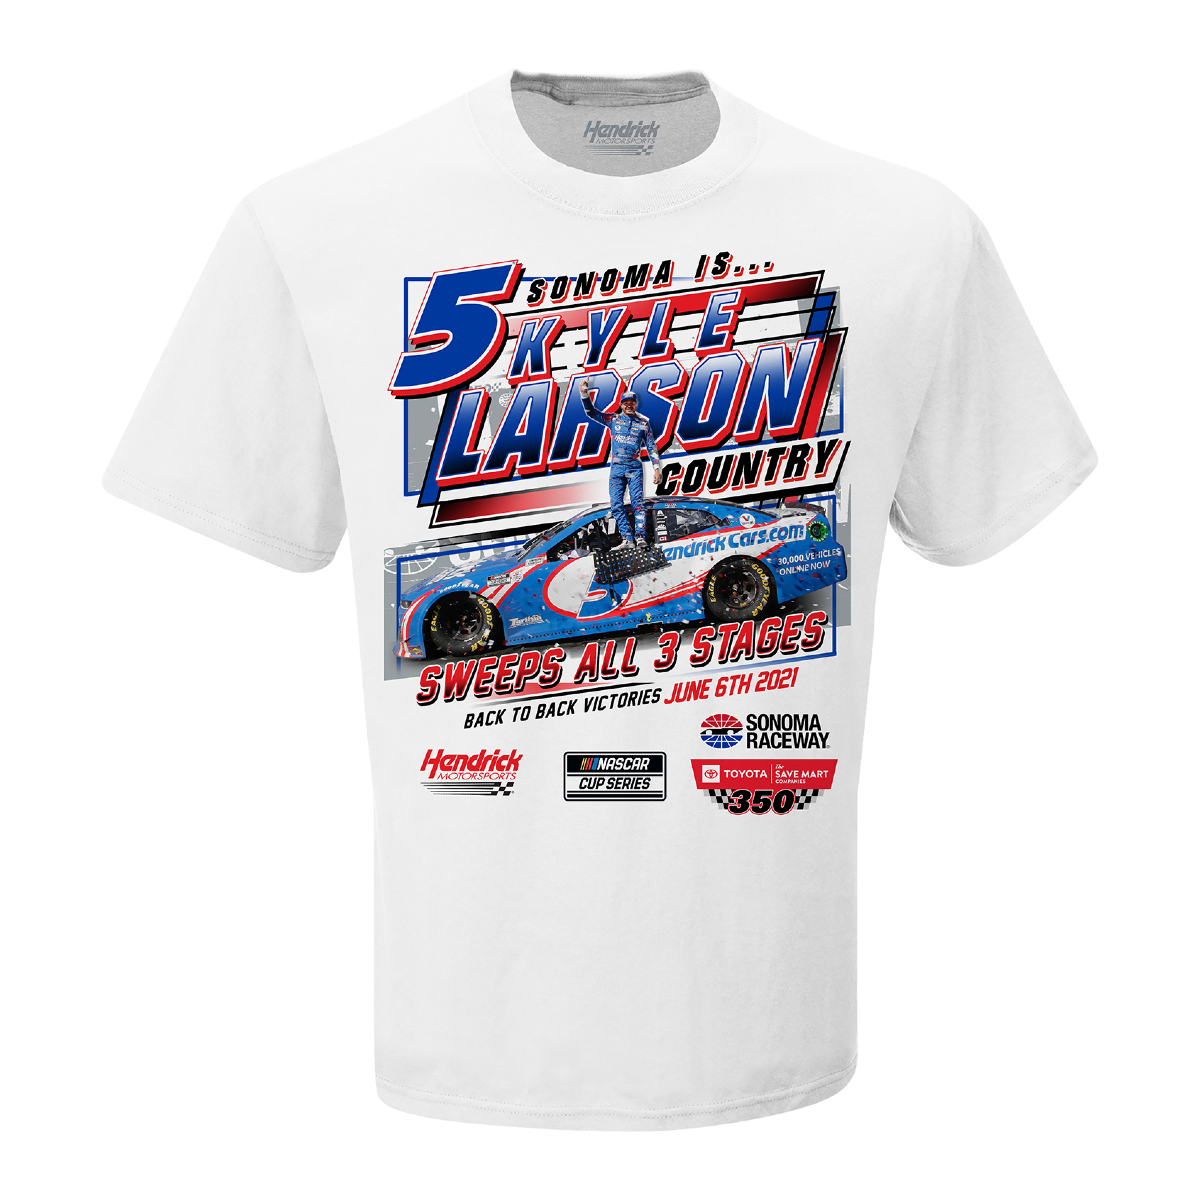 Kyle Larson 2021 NASCAR Sonoma Race Win T-shirt